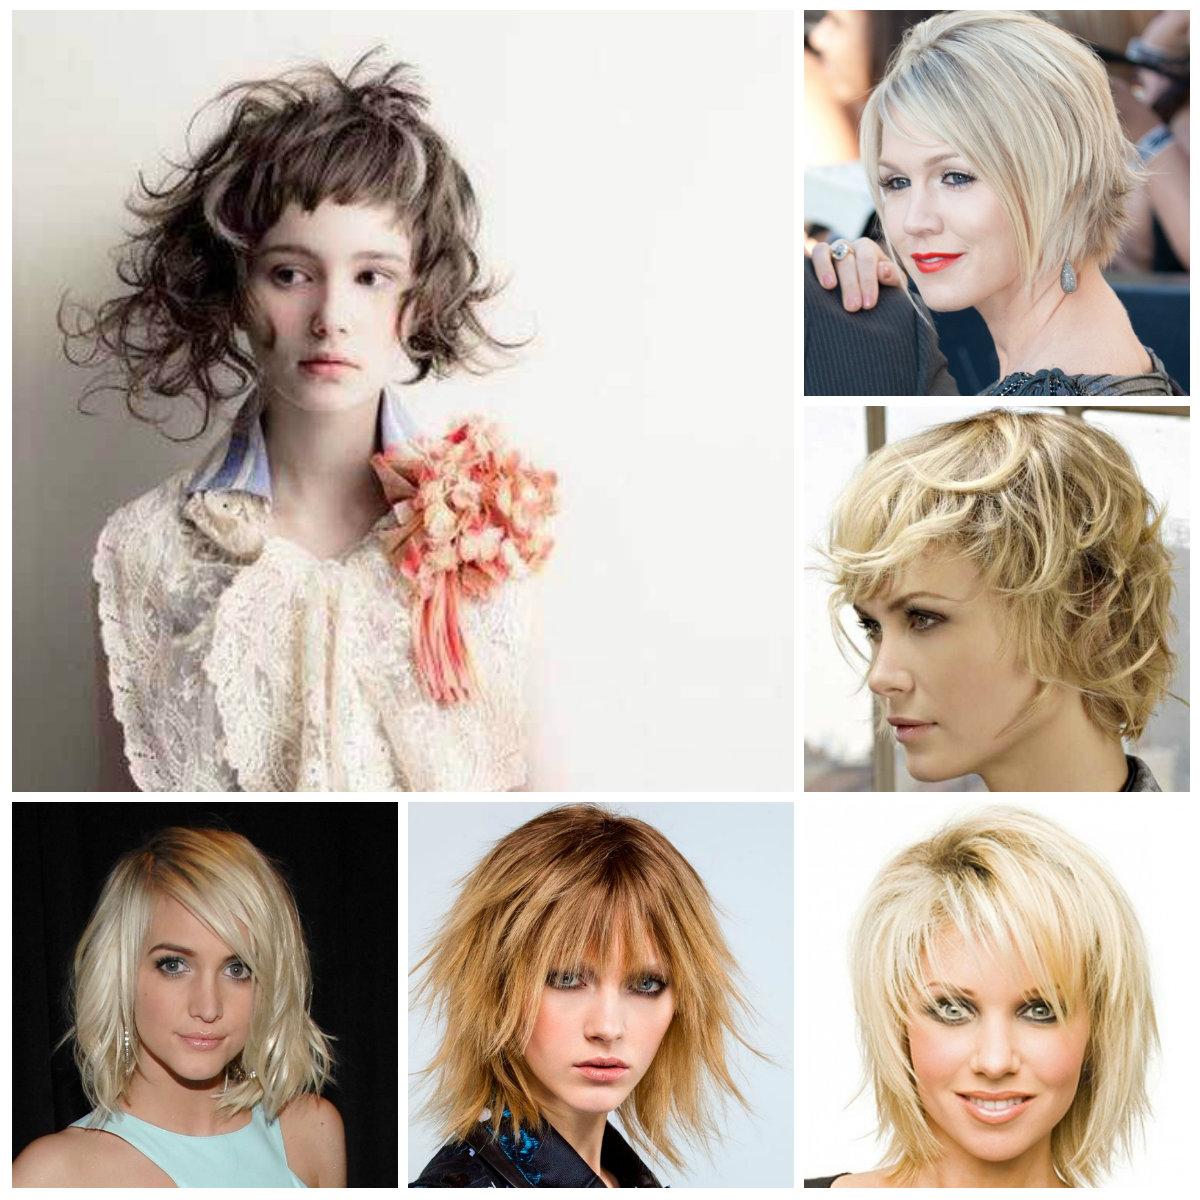 Popular Voluminous Medium Shag Haircuts For Shag Hairstyles For Fine Hair » Best Hairstyles For Girls (View 15 of 20)